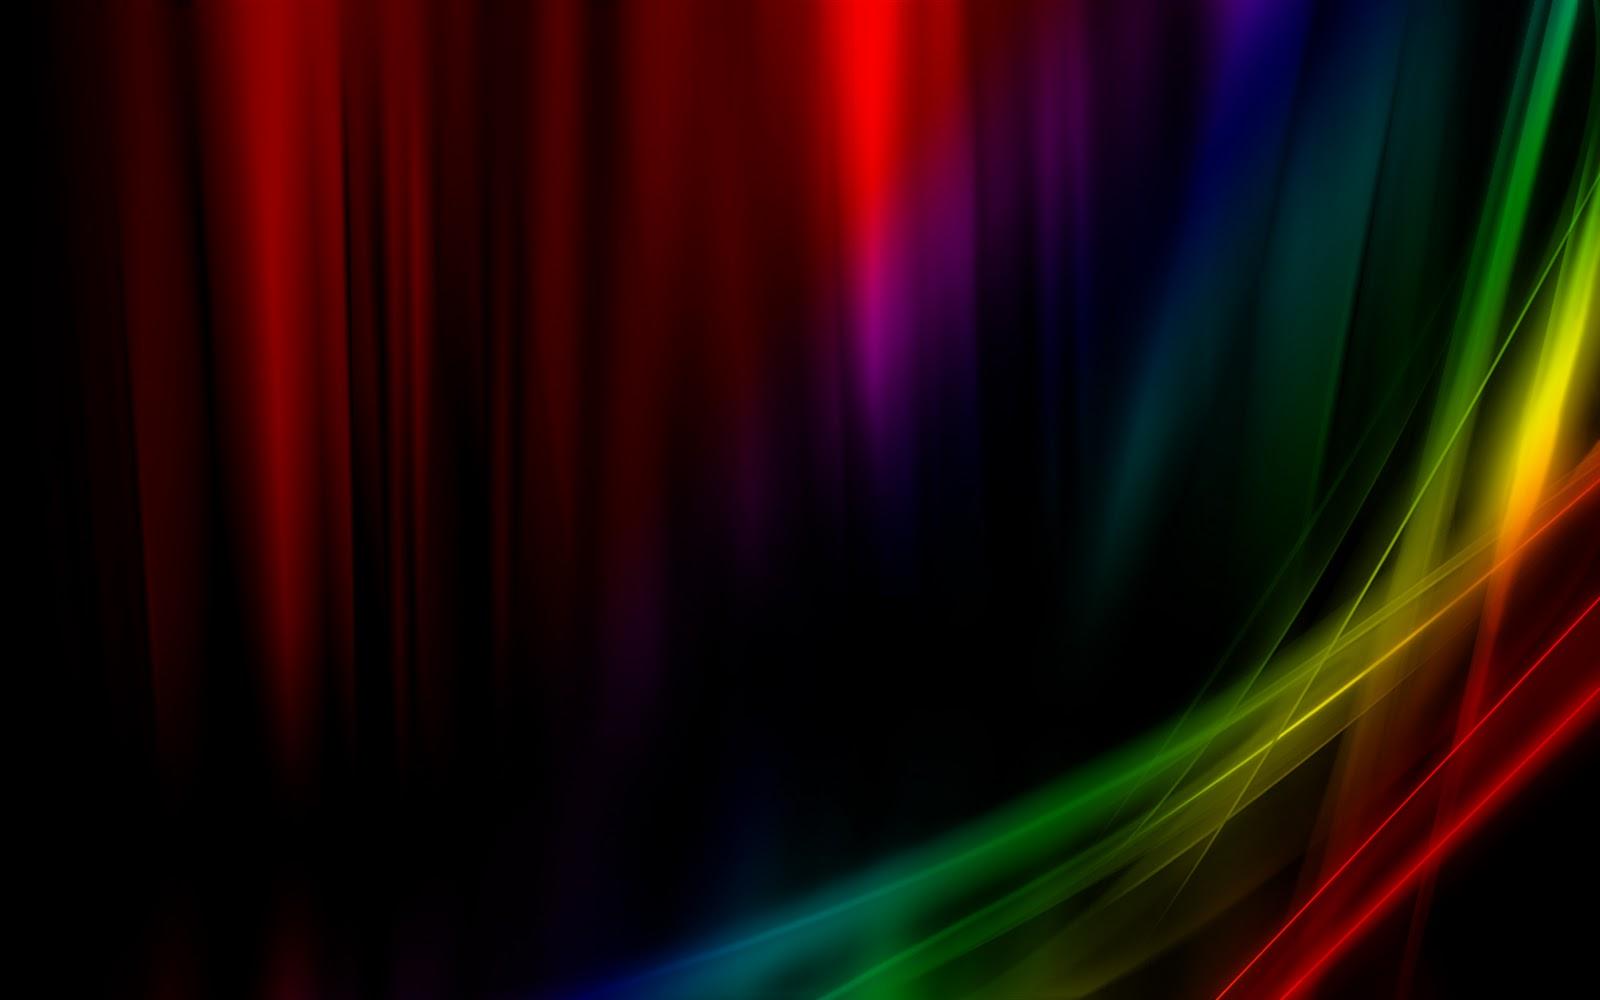 colores fondos de escritorio - photo #16